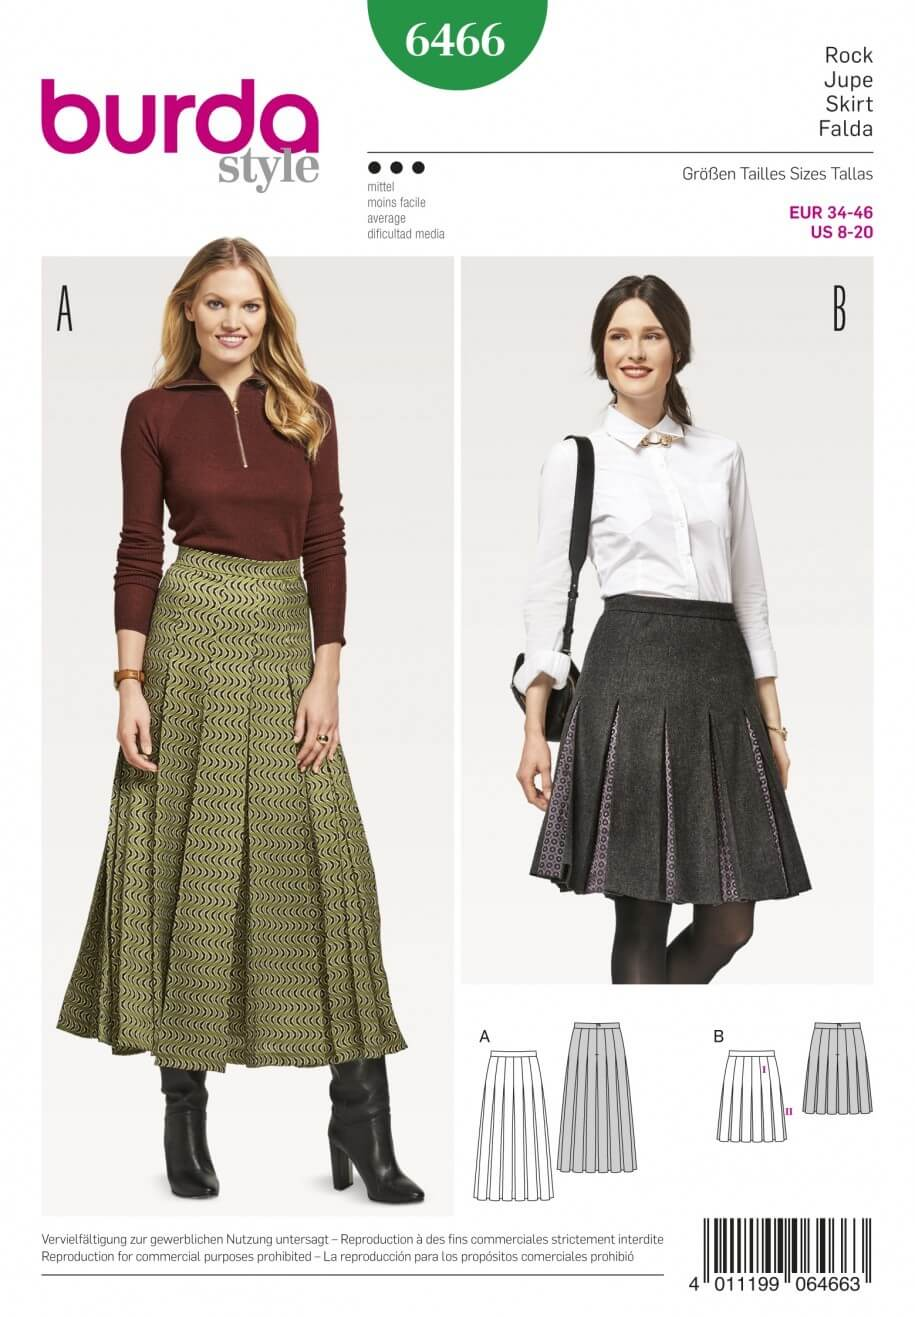 Burda Style Women's Pleated Skirt with Waistband Dress Sewing Pattern 6466